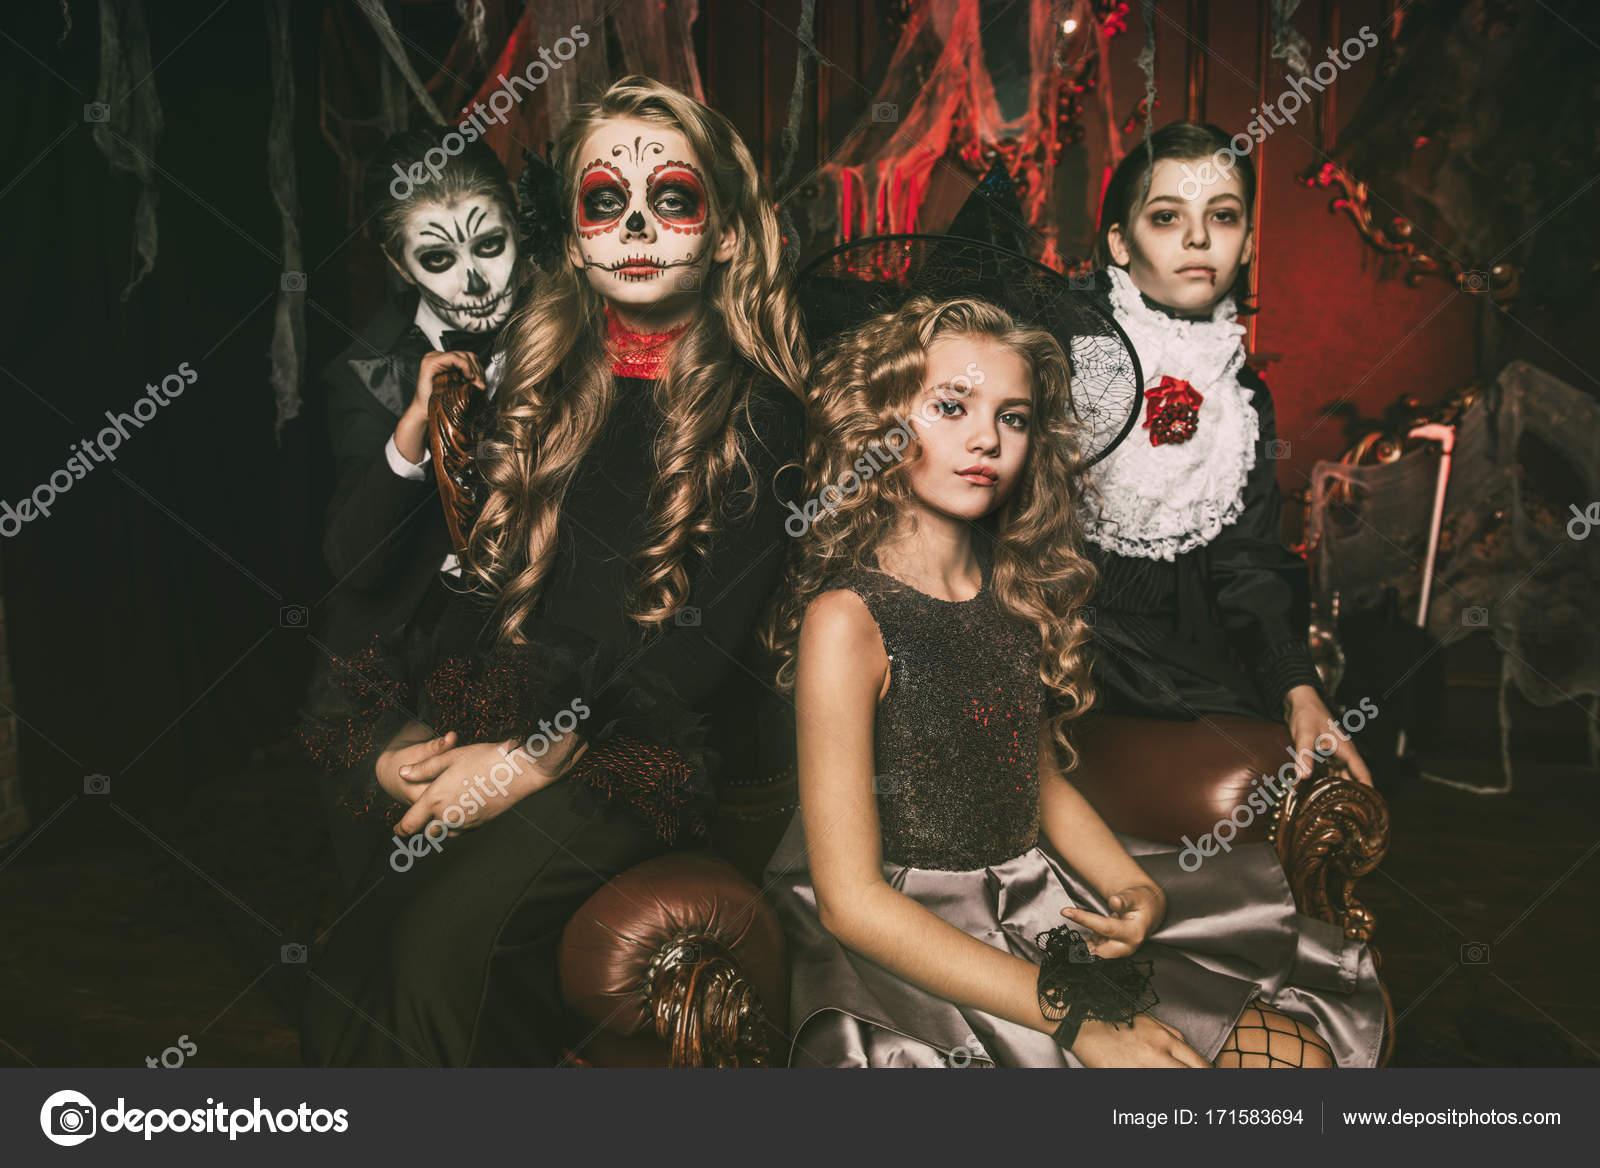 Film Di Halloween Per Bambini.Film Fantasy Per Bambini Foto Stock C Prometeus 171583694